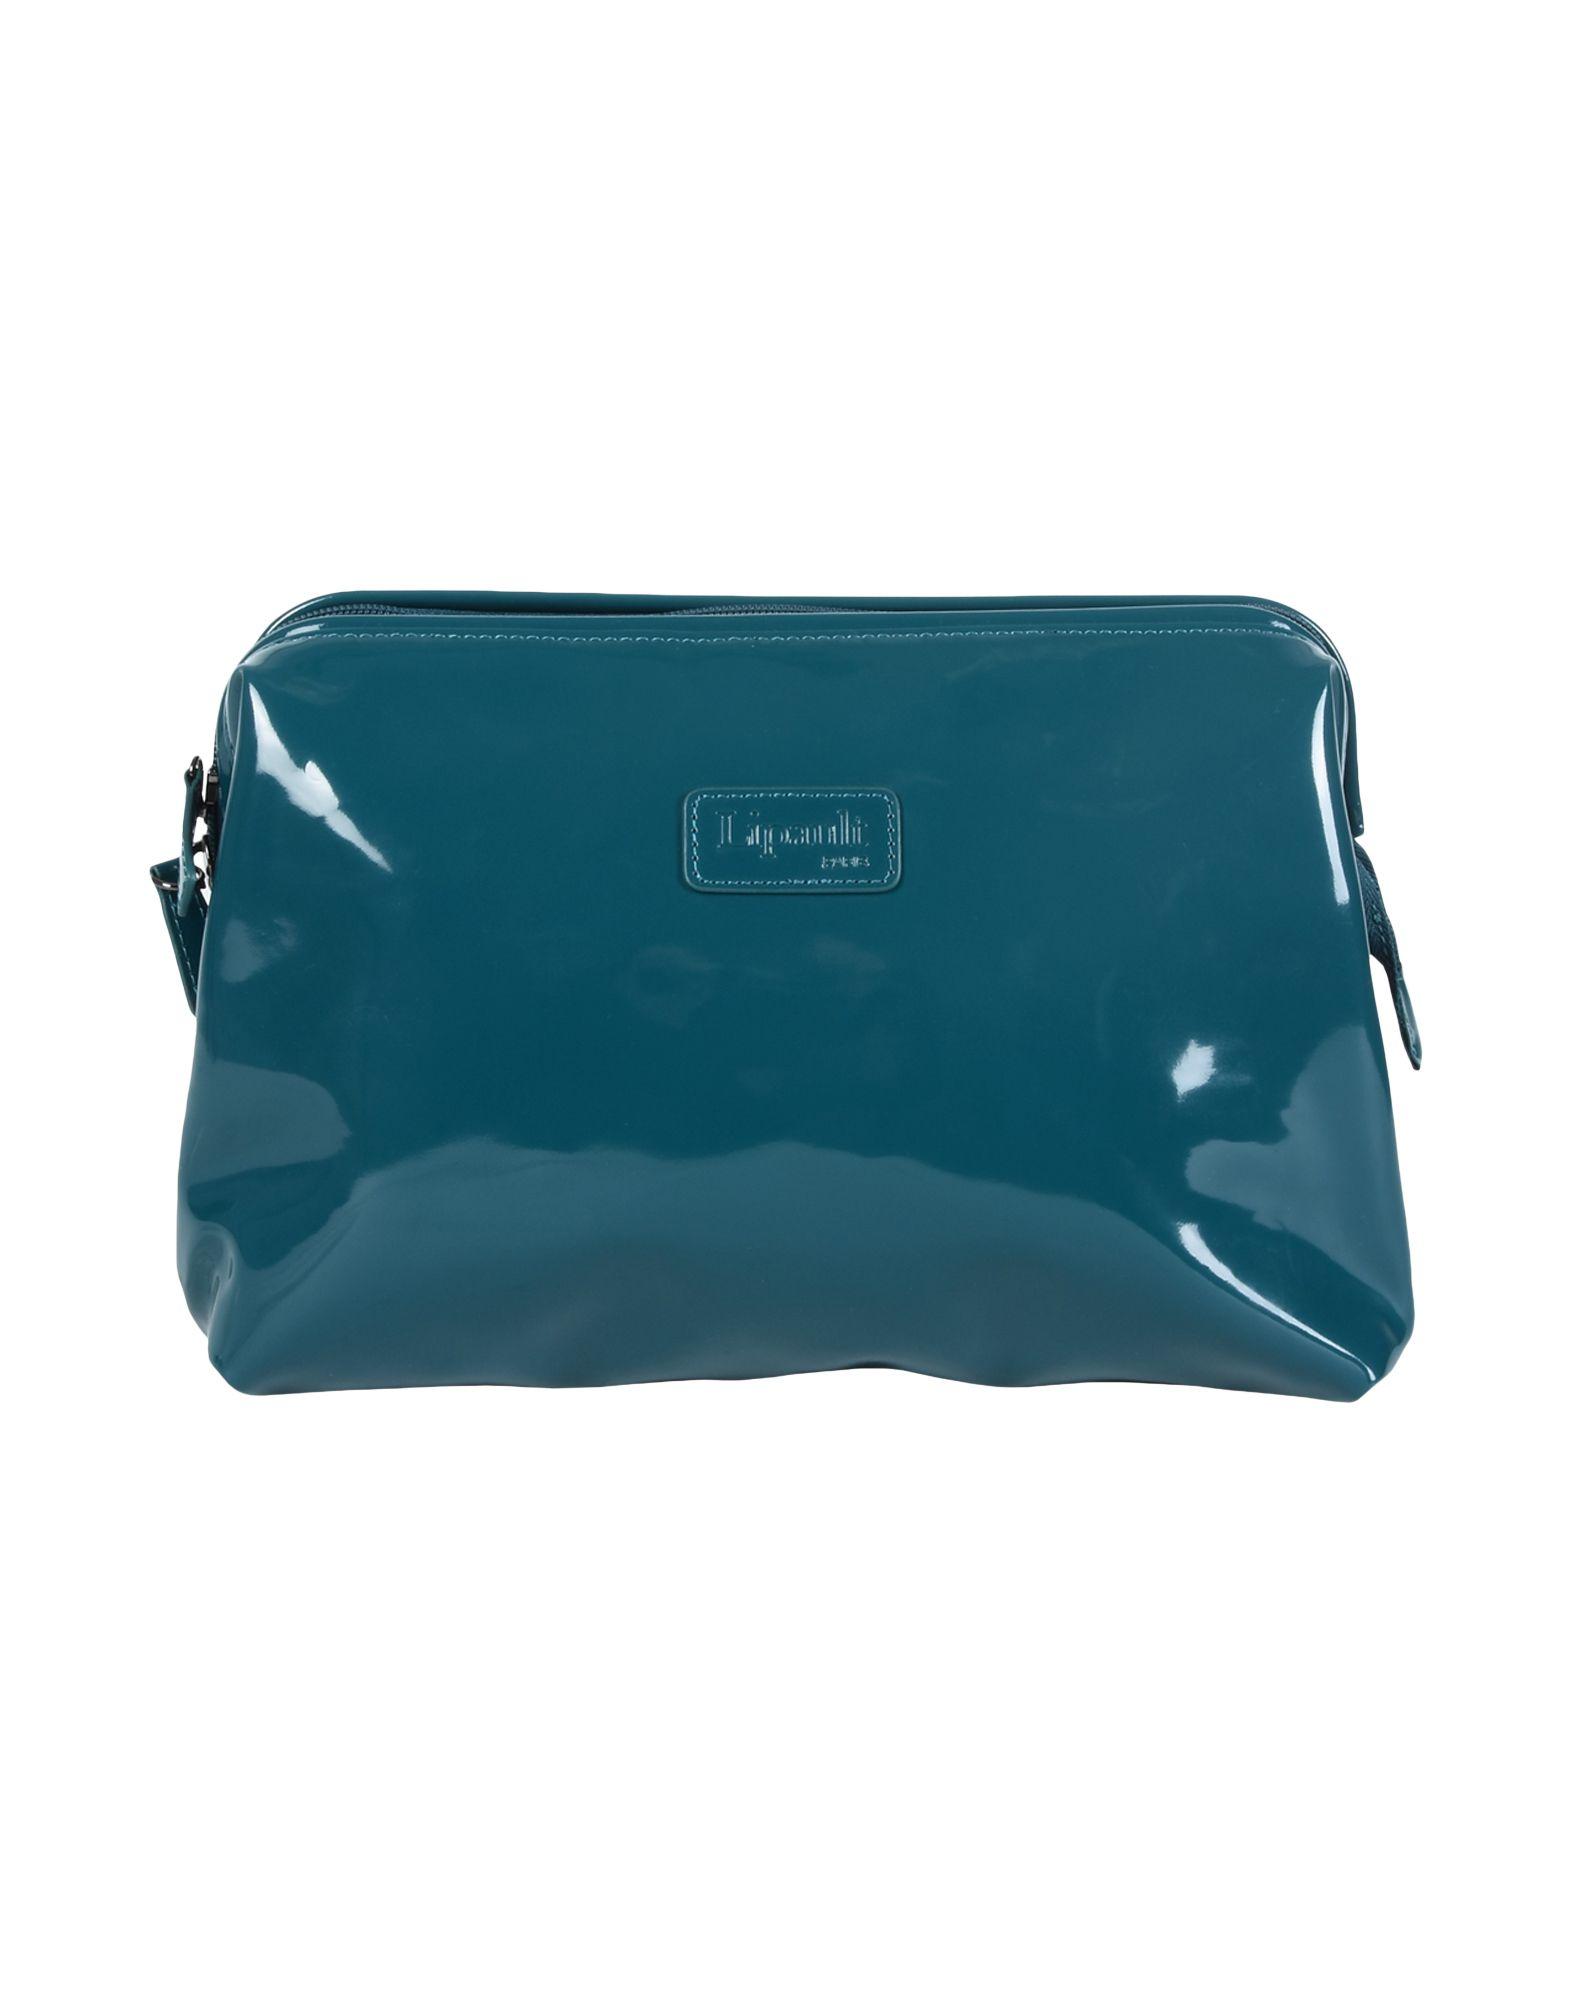 LIPAULT Beauty case lipault сумка lipault p51 91103 лавандовый